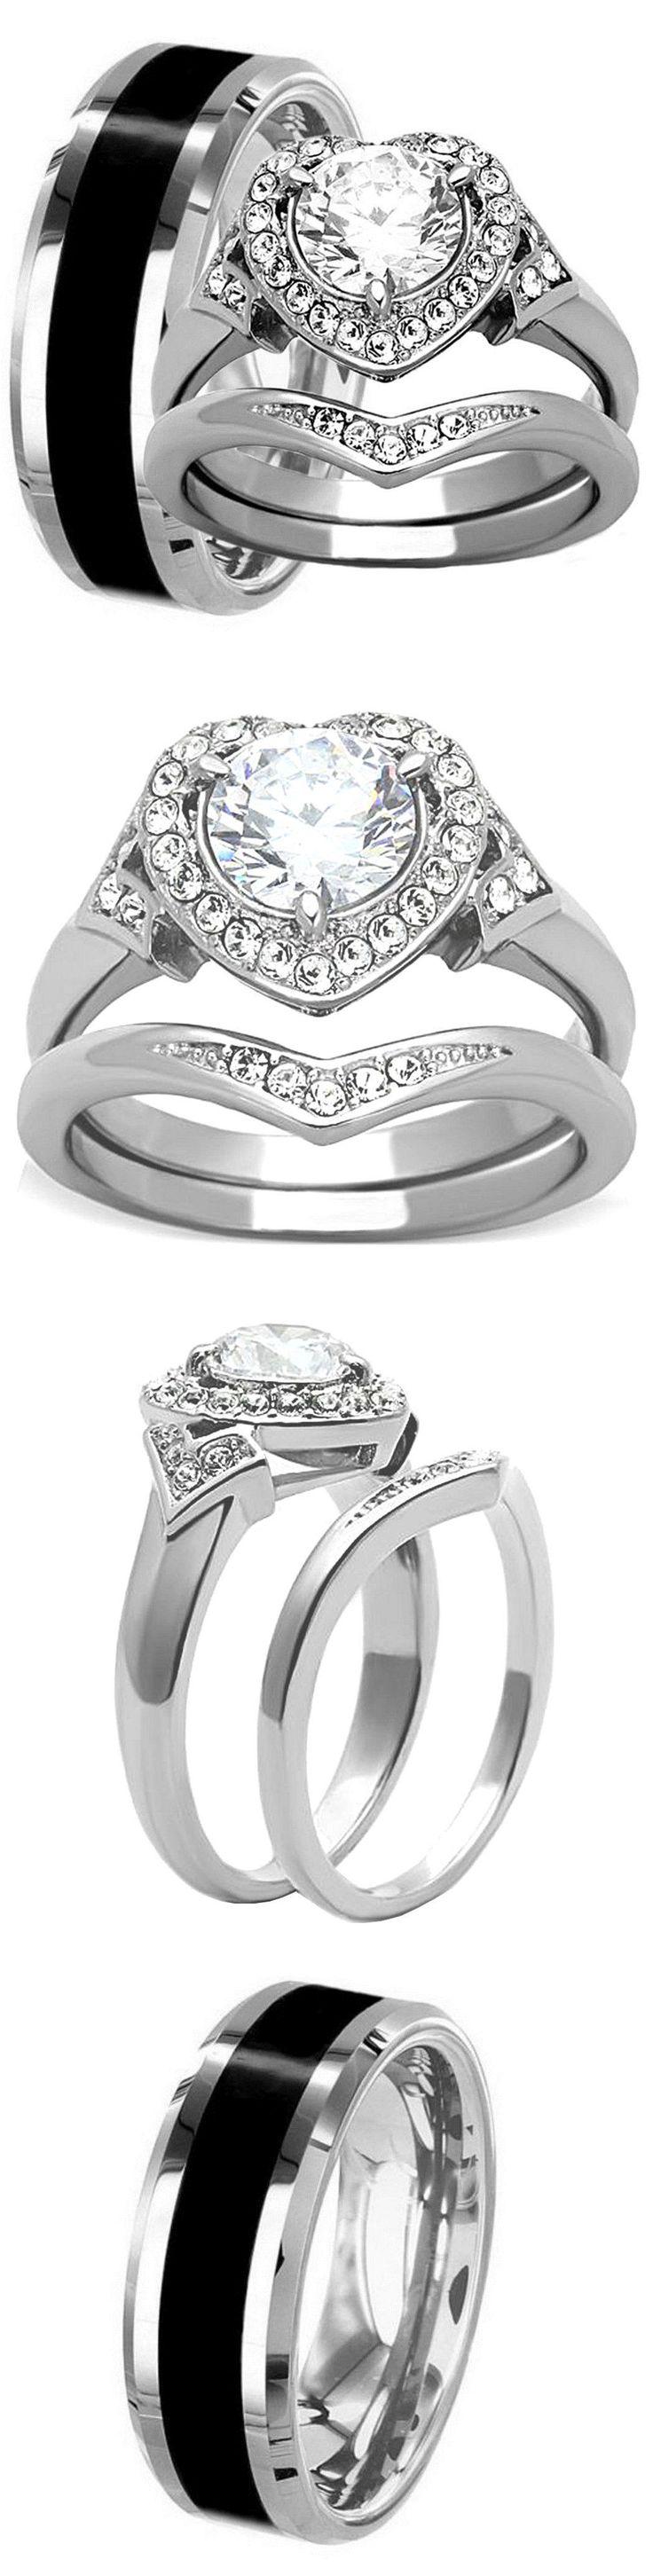 men jewelry ebay wedding rings sets Men Jewelry Men S Black Titanium 8Mm Wedding Band And Women S Halo Cz Stainless